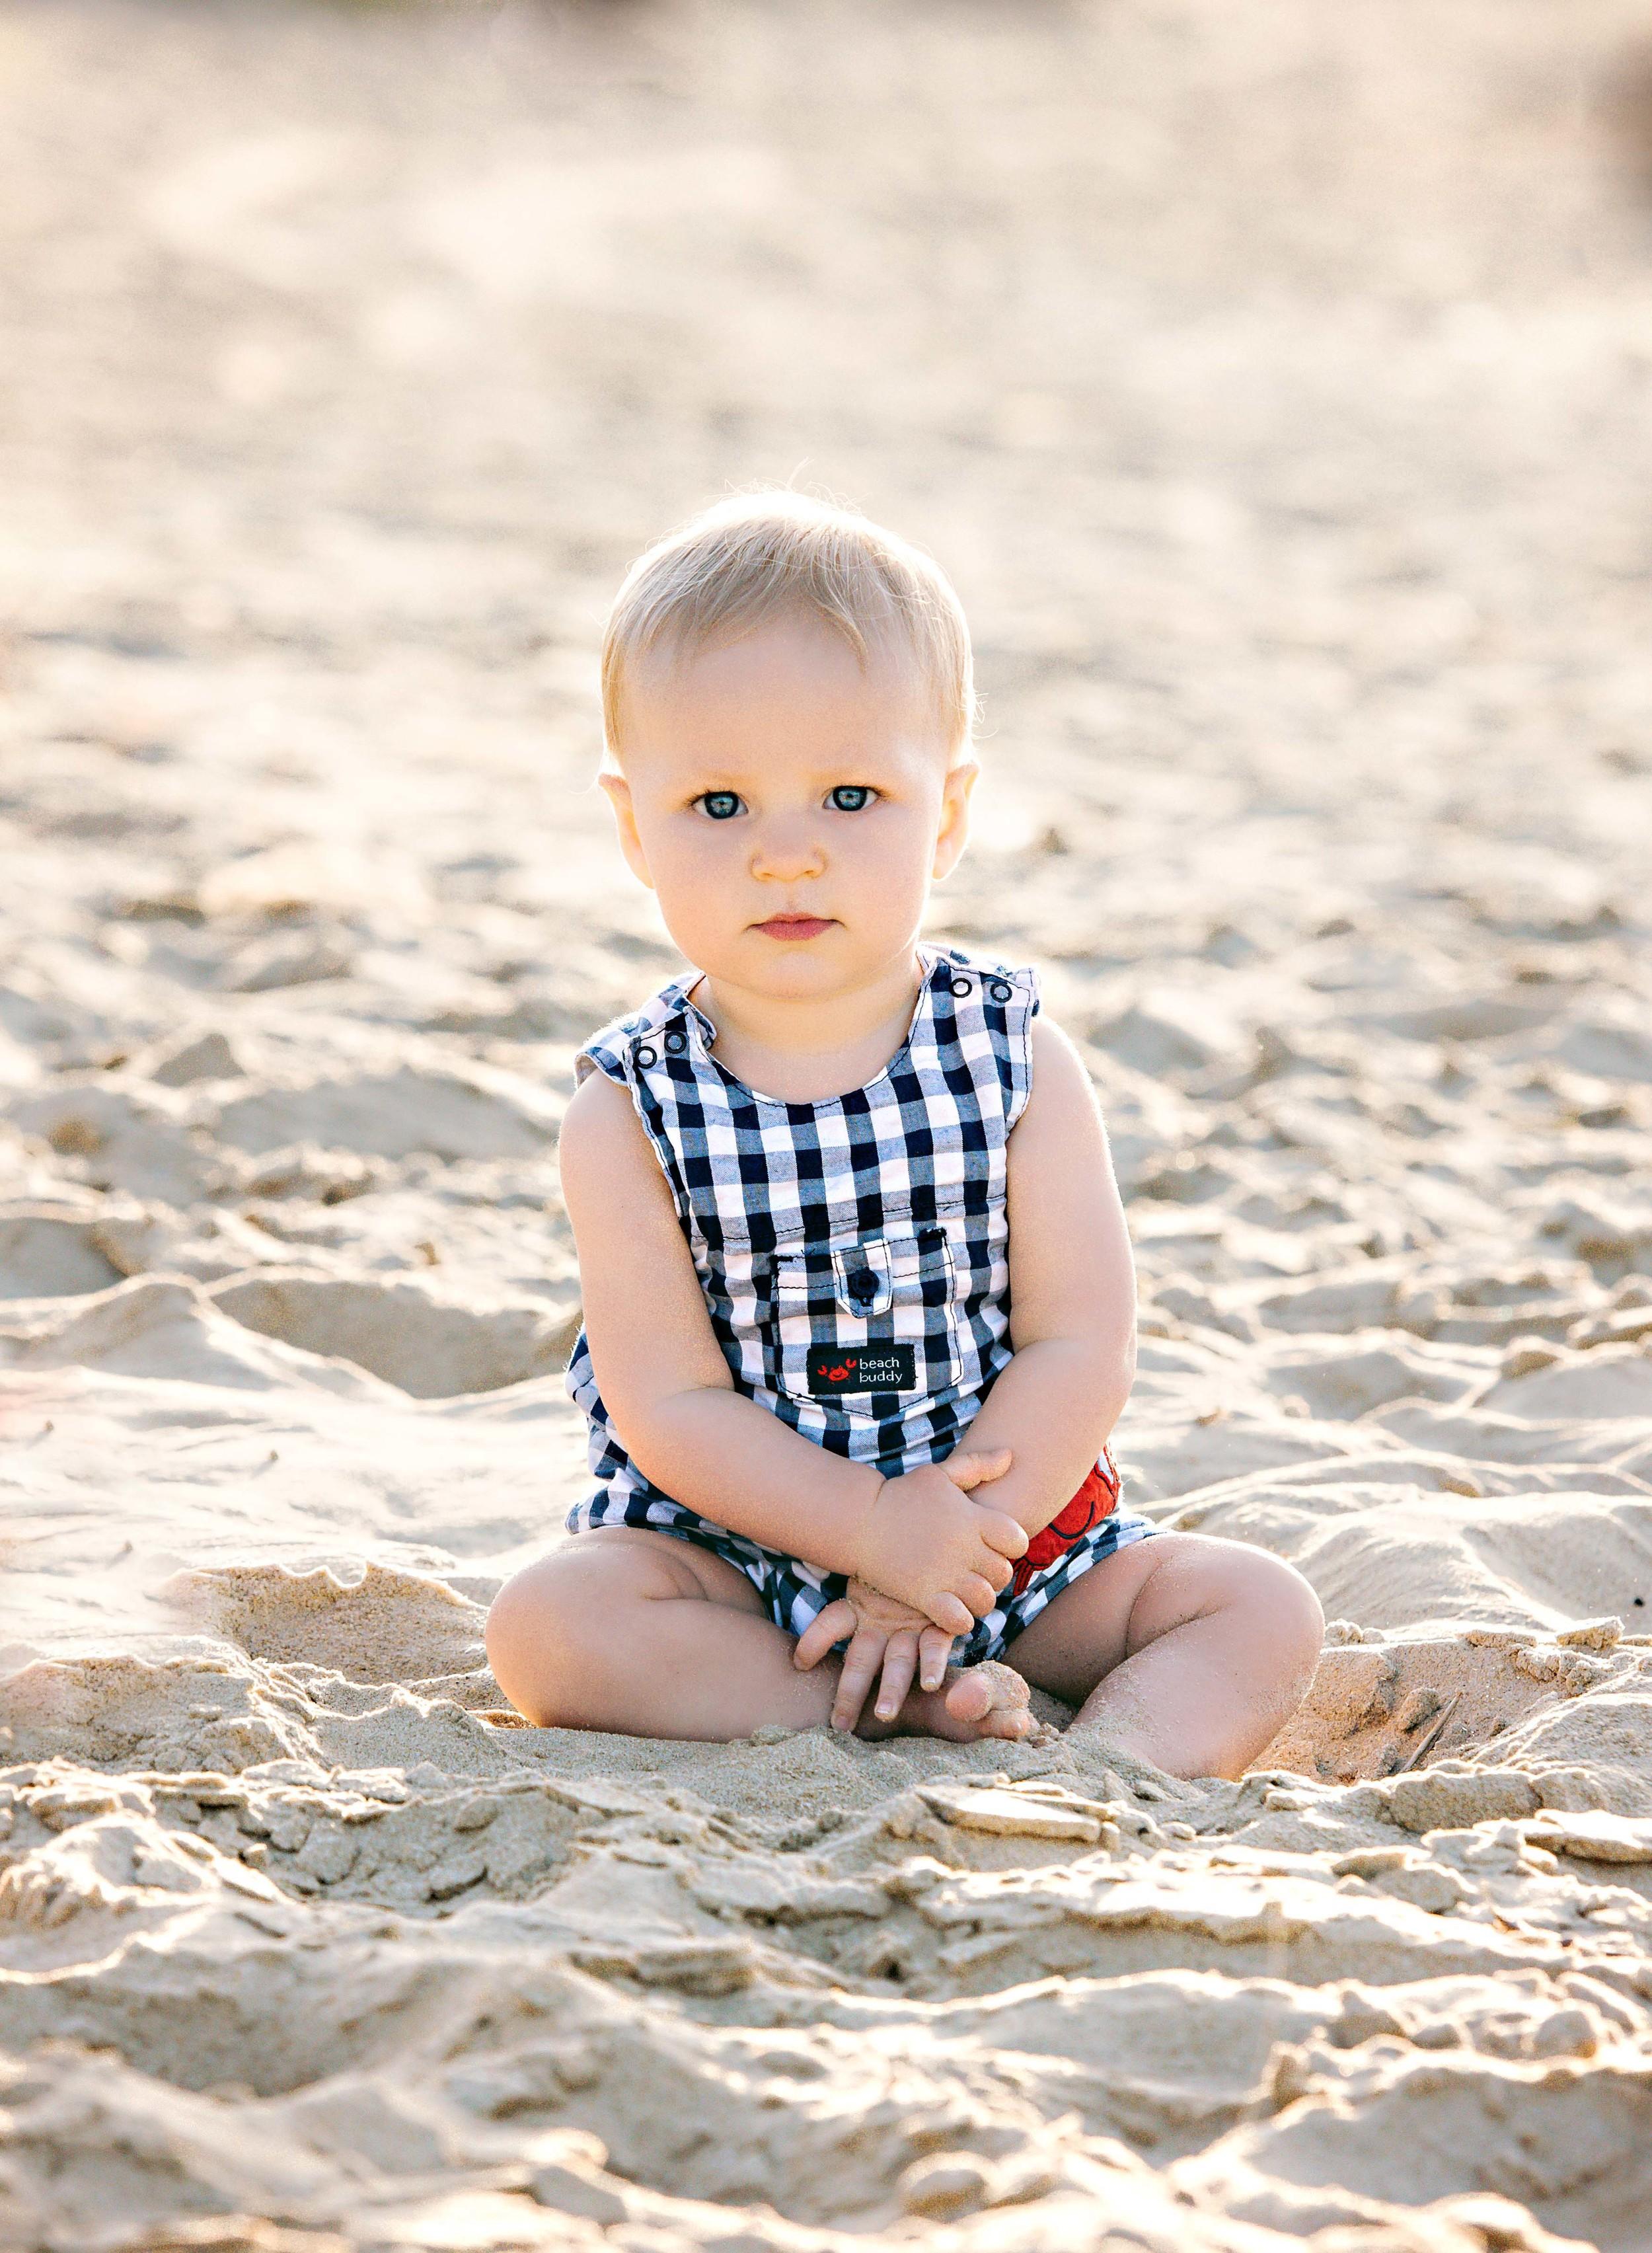 melissa-bliss-photography-child-family-photographer-norfolk-portsmouth-chesapeake-sandbridge-virginia-beach-photographers